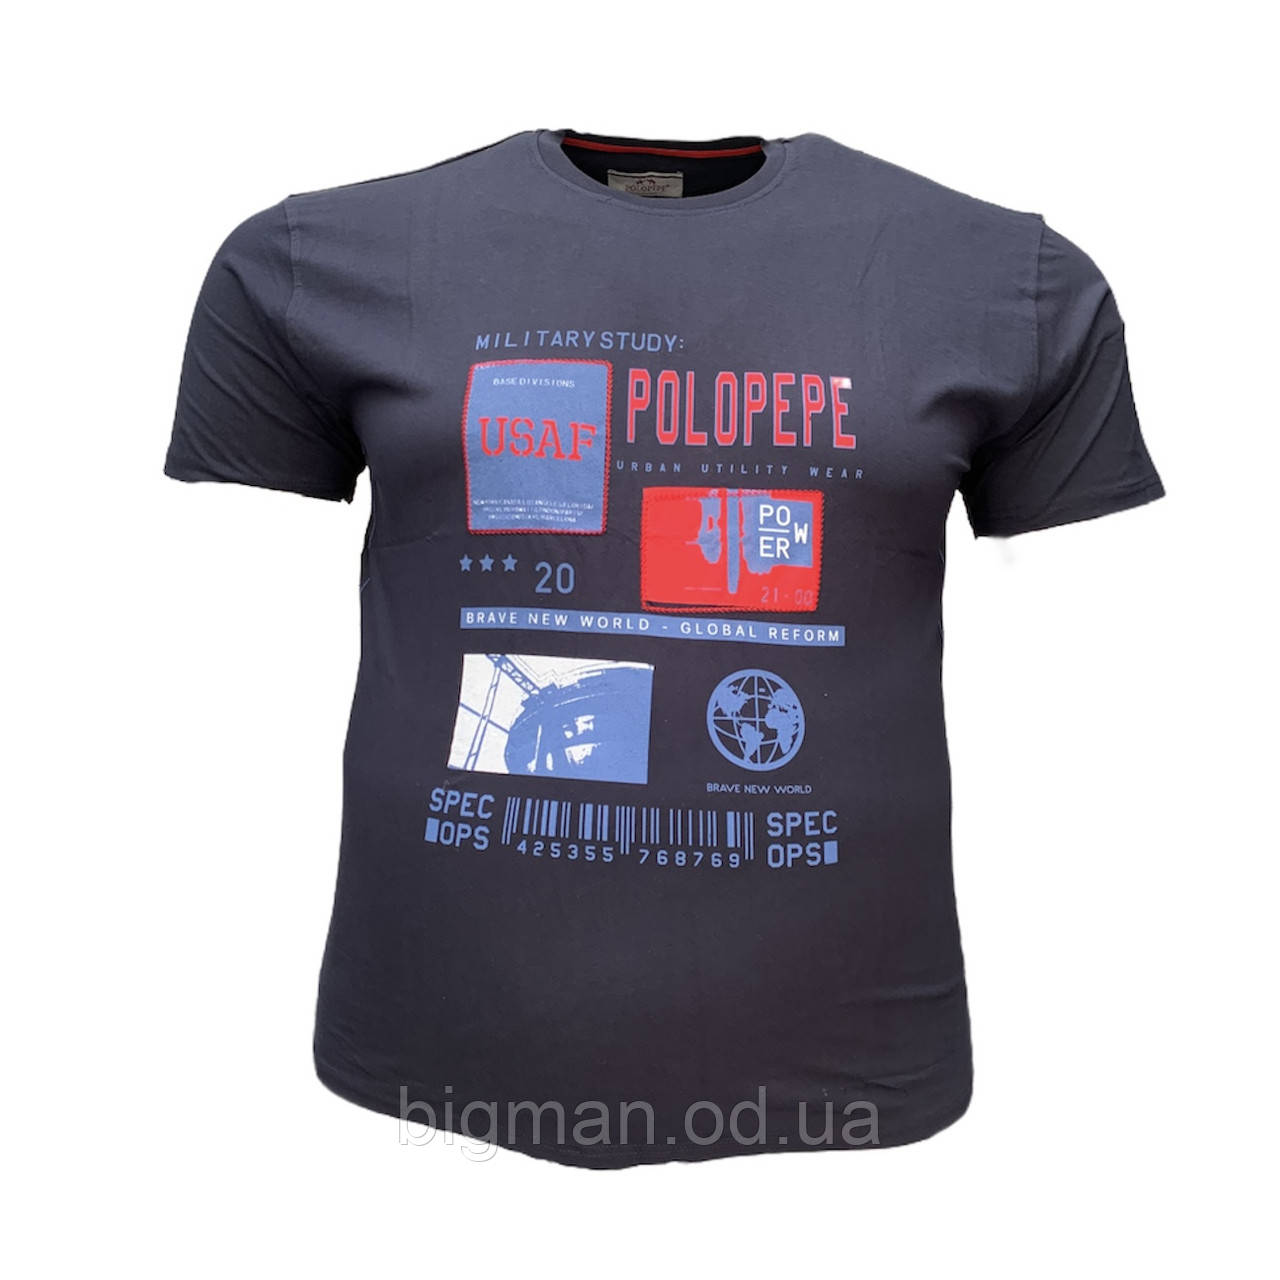 Мужская батальная футболка PoloPepe 12103 3XL 4XL 5XL 6XL темно-синяя большие размеры Турция